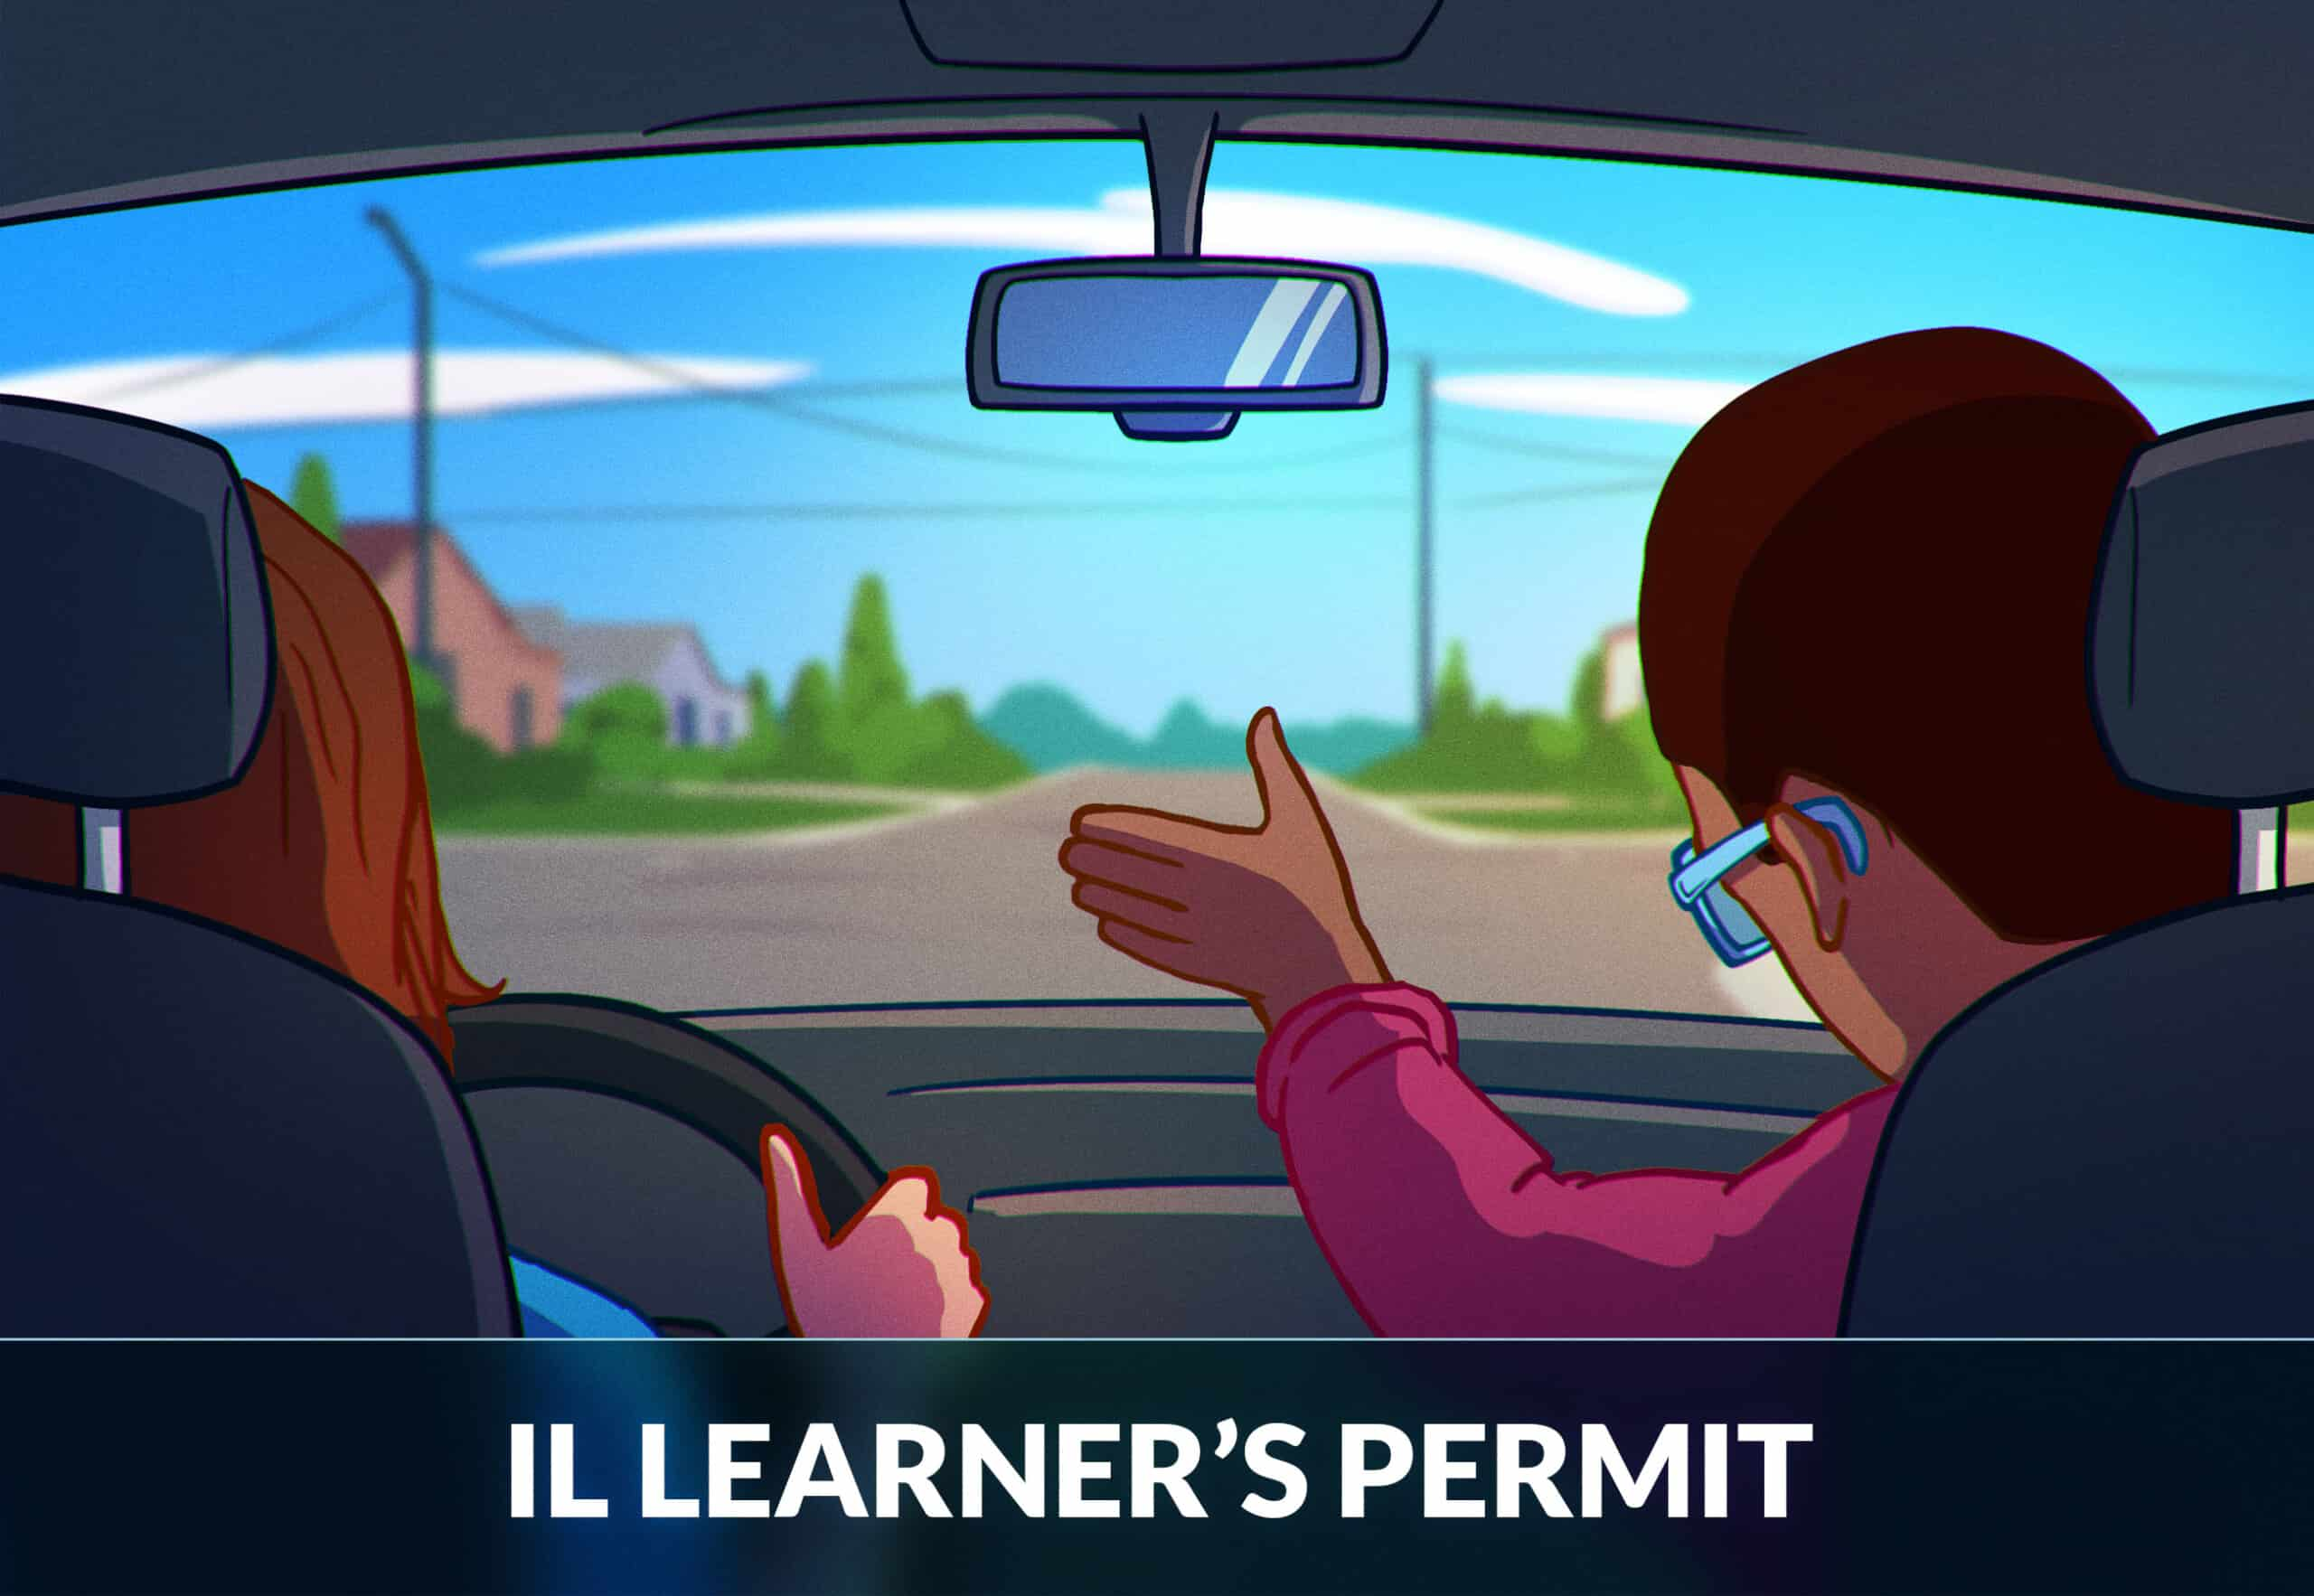 Illinois Learner's Permit